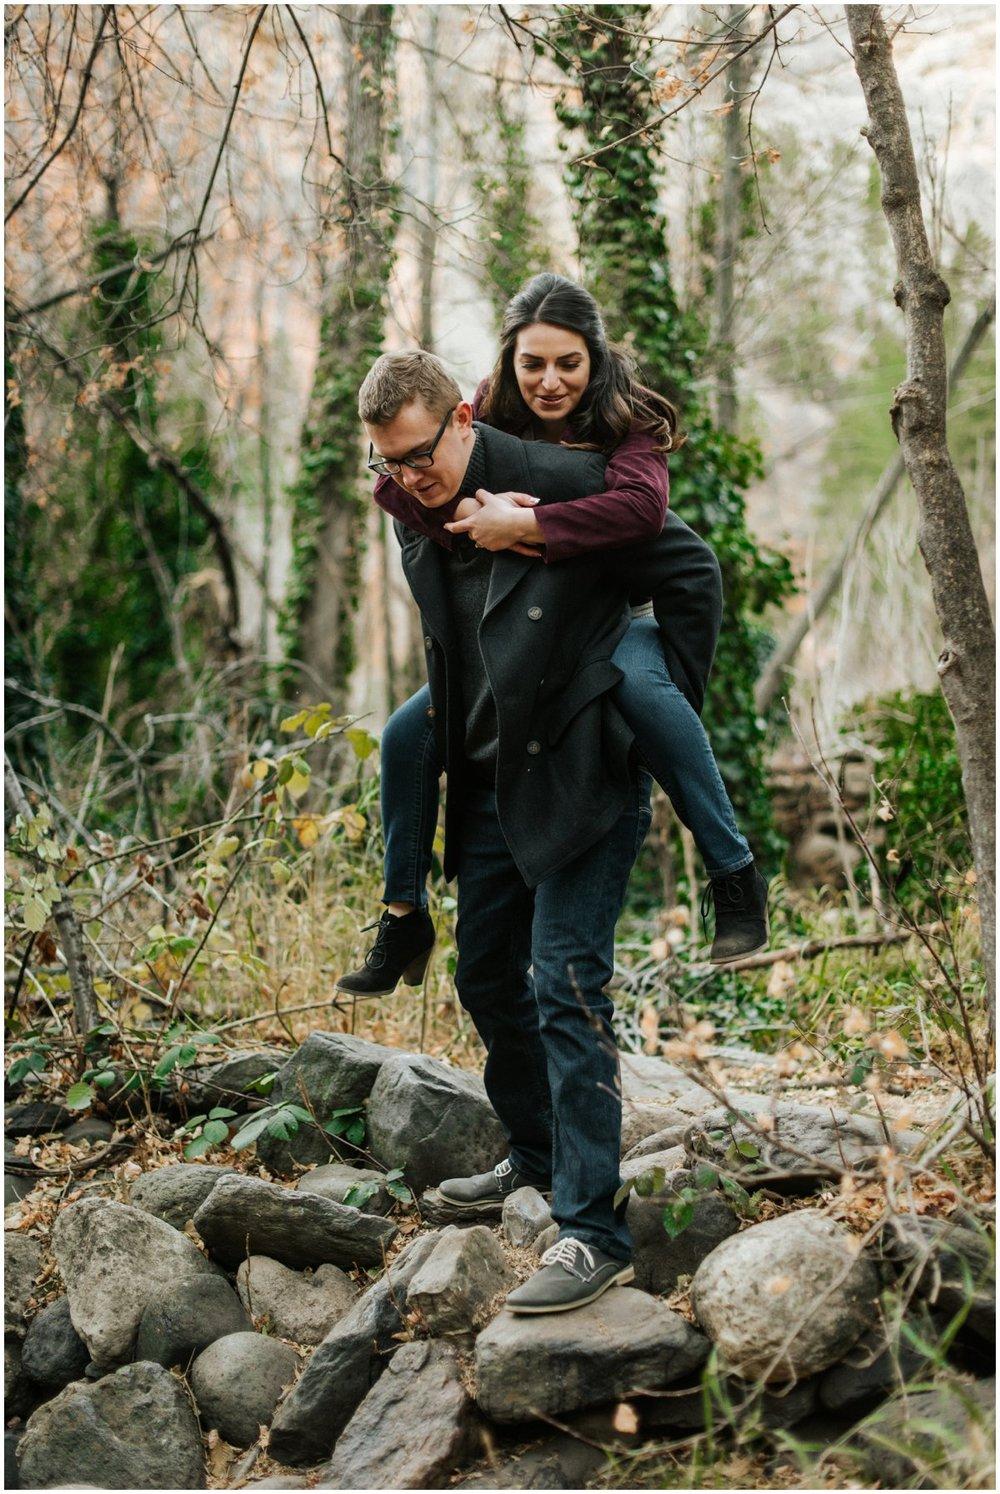 Fun Engagement Photos in Sedona, Arizona during Winter.